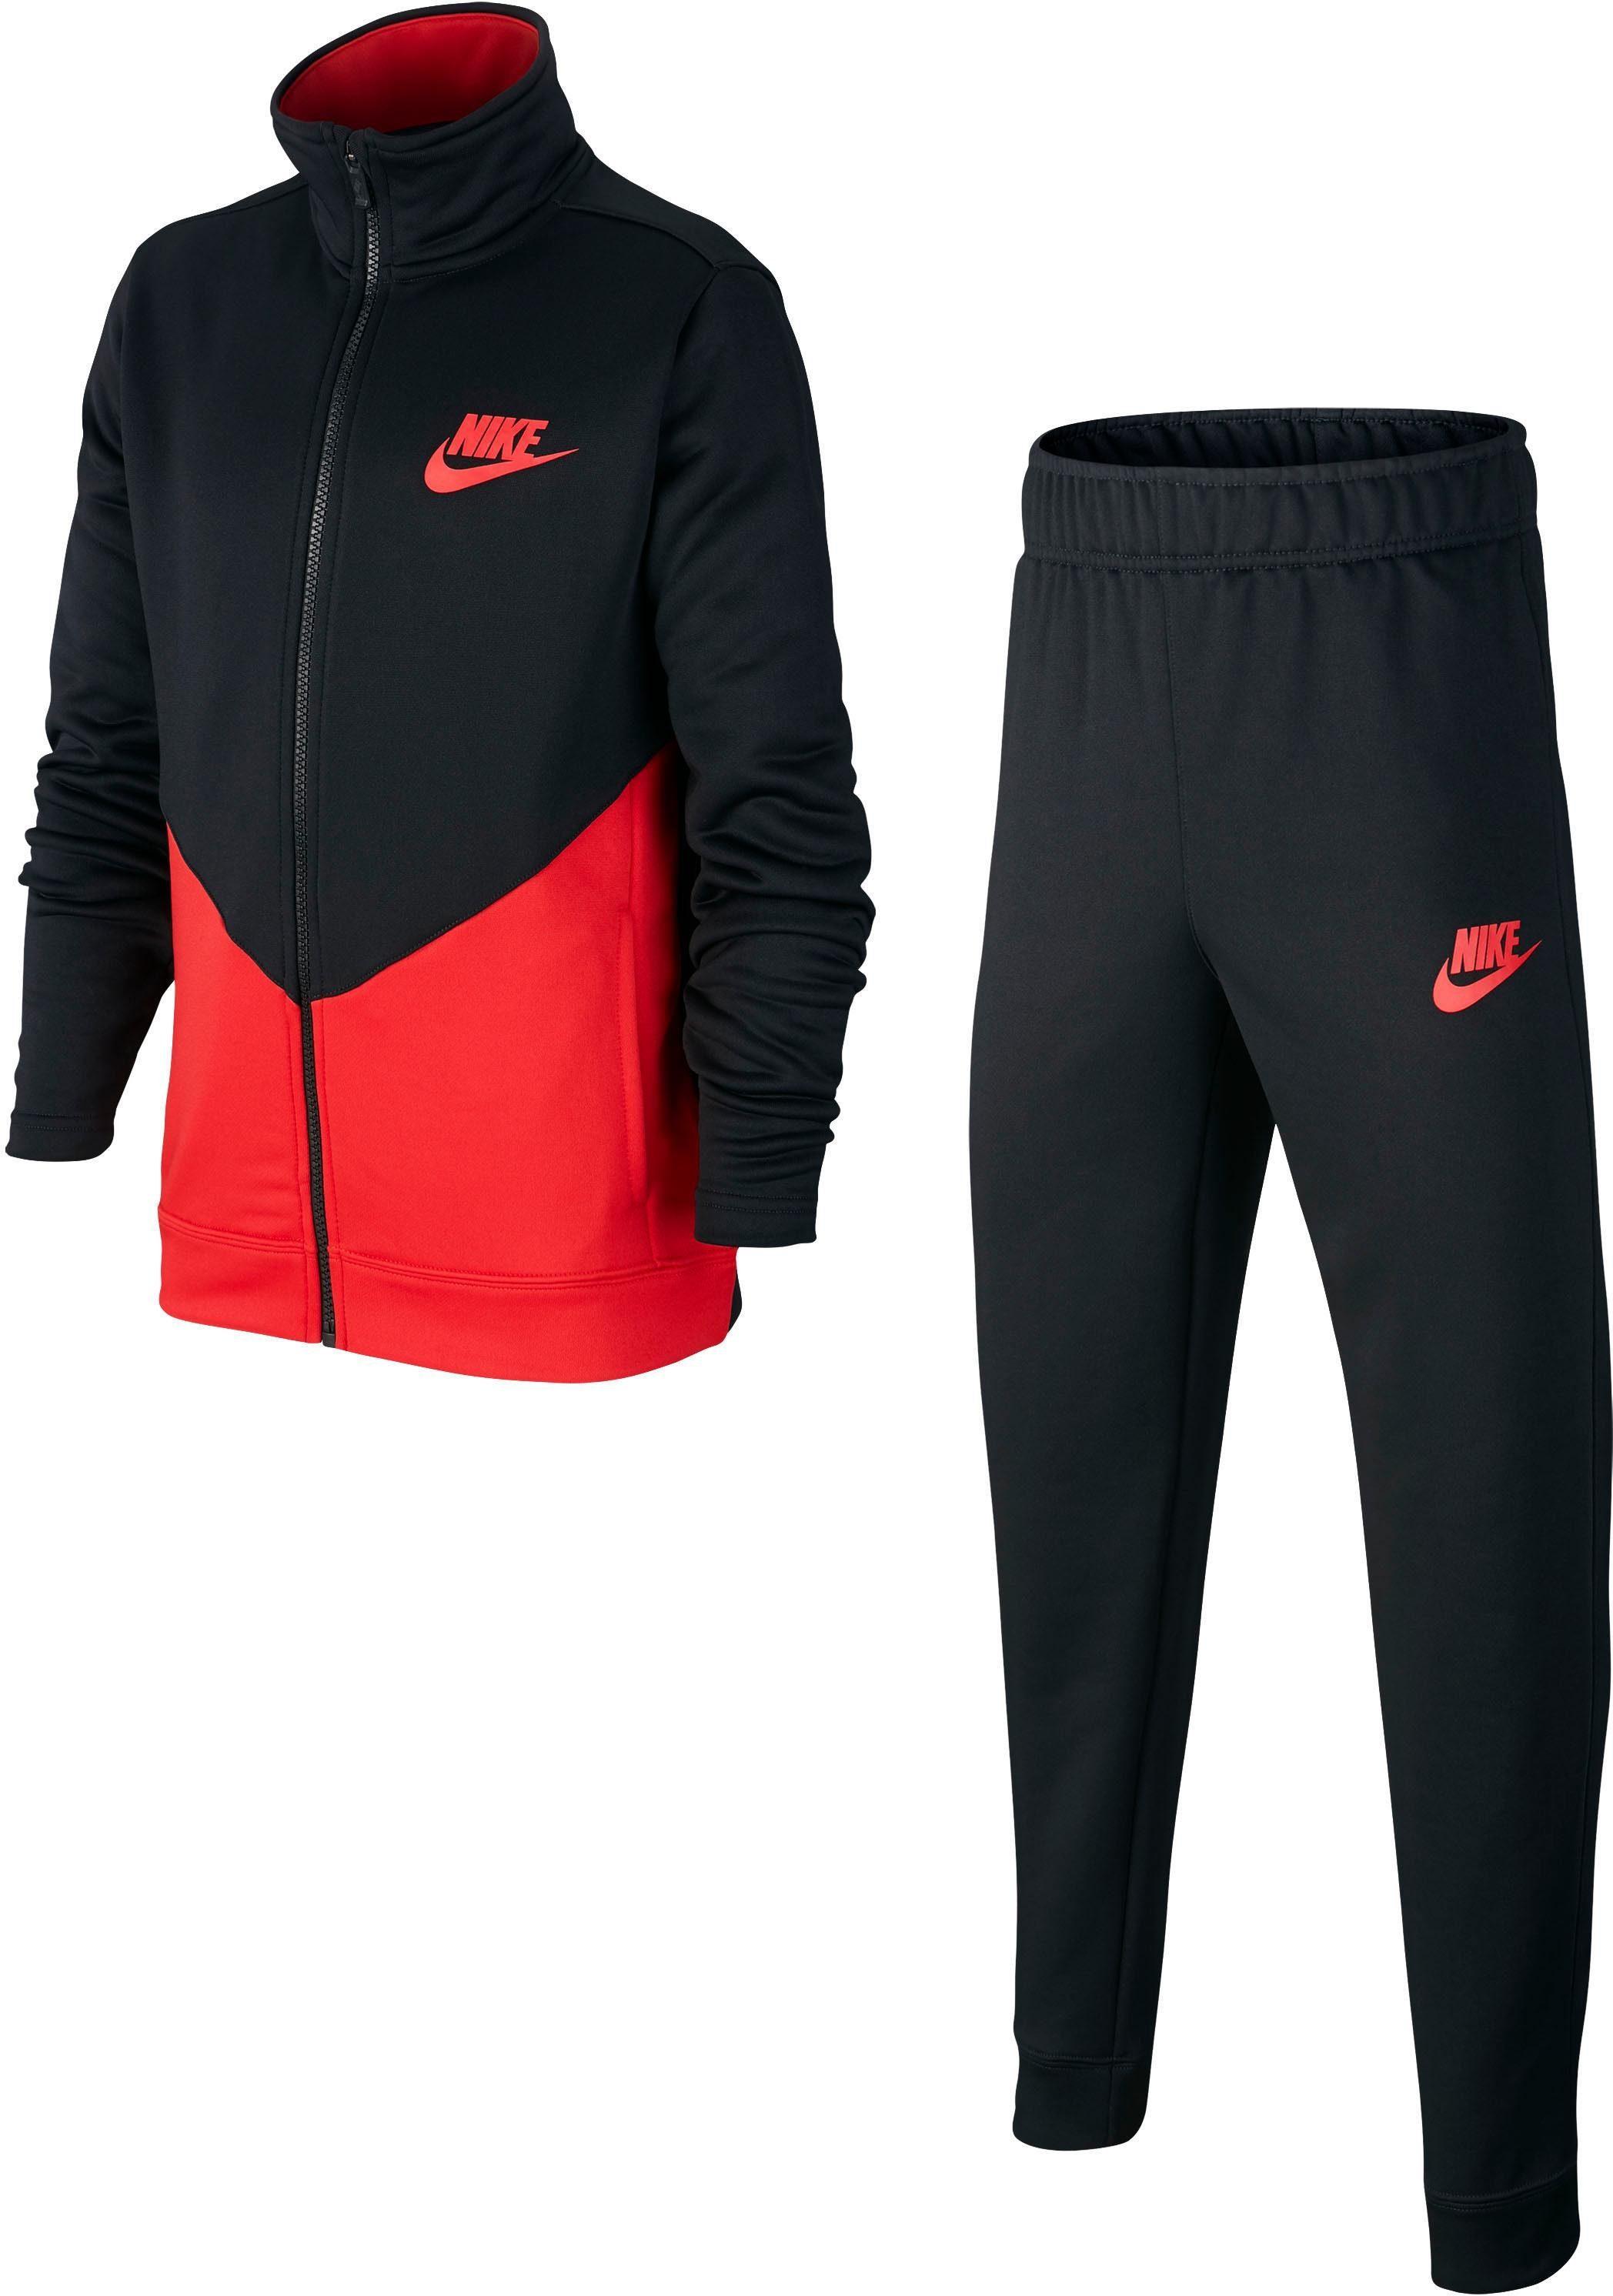 Nike Sportswear Trainingsanzug »BOYS NIKE SPORTSWEAR CORE TRACKSUIT PLAY FUTURA« (Set, 2 tlg) online kaufen | OTTO